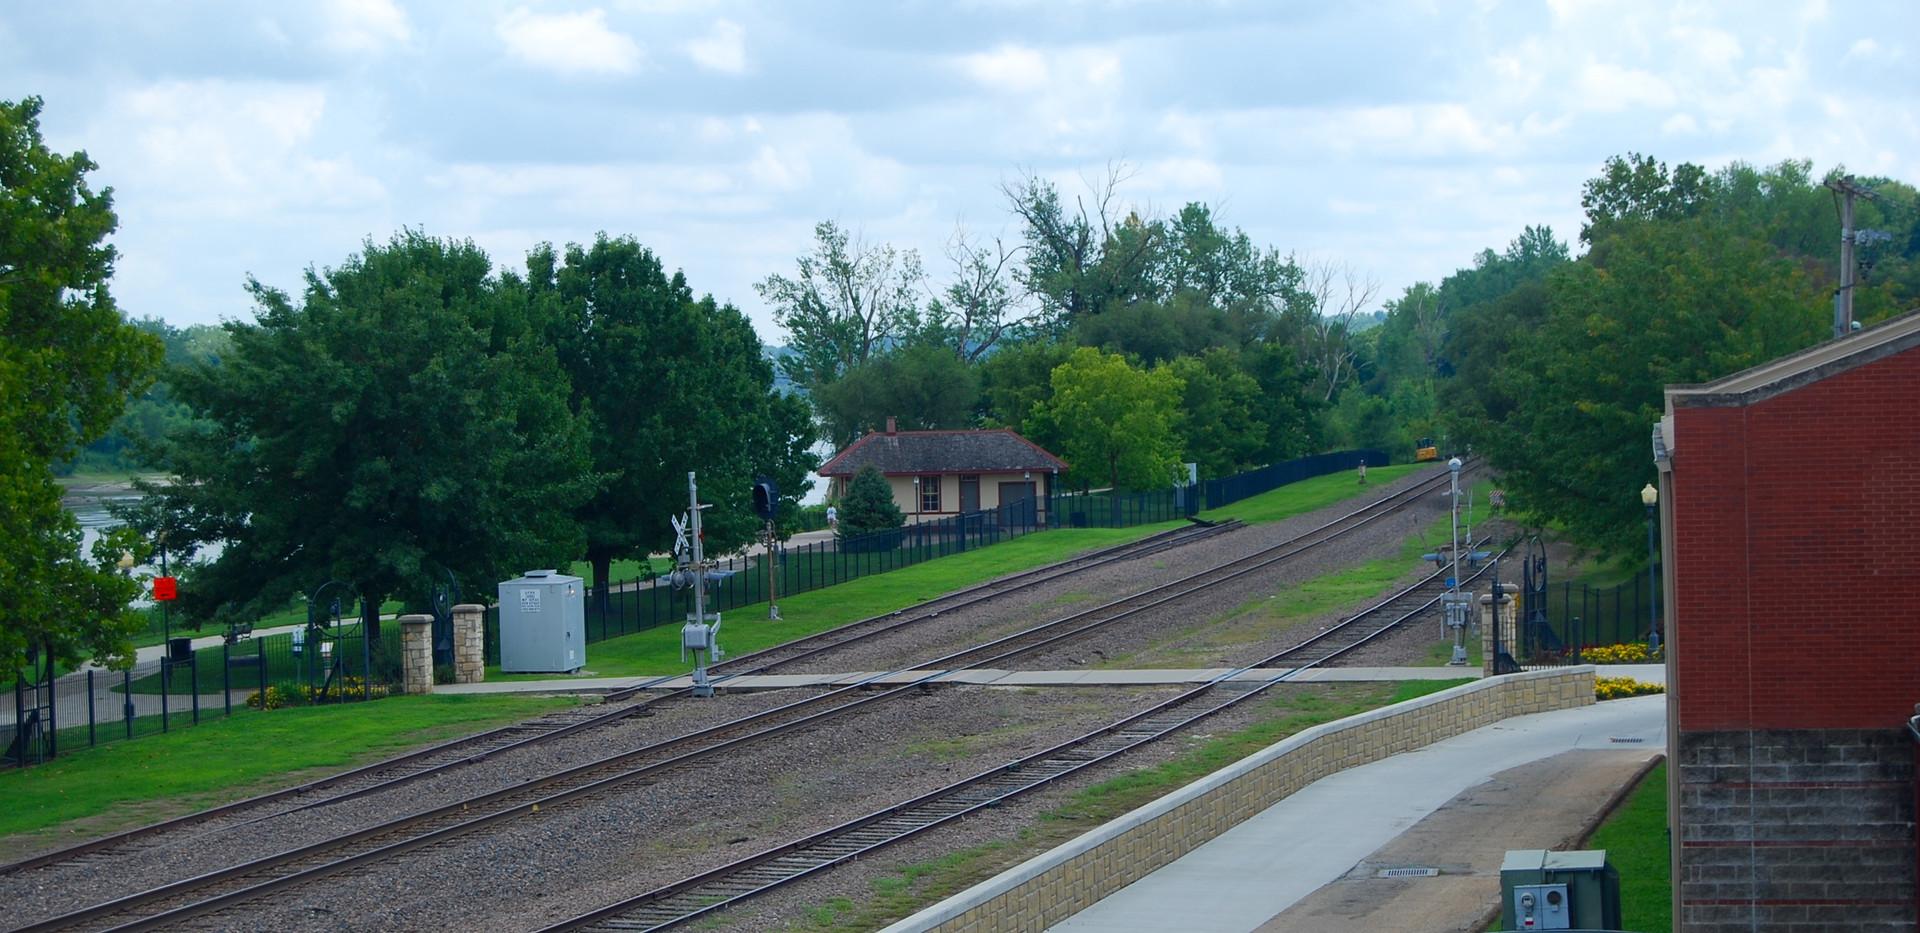 Union Station (CGW depot/bridge tender pictured)